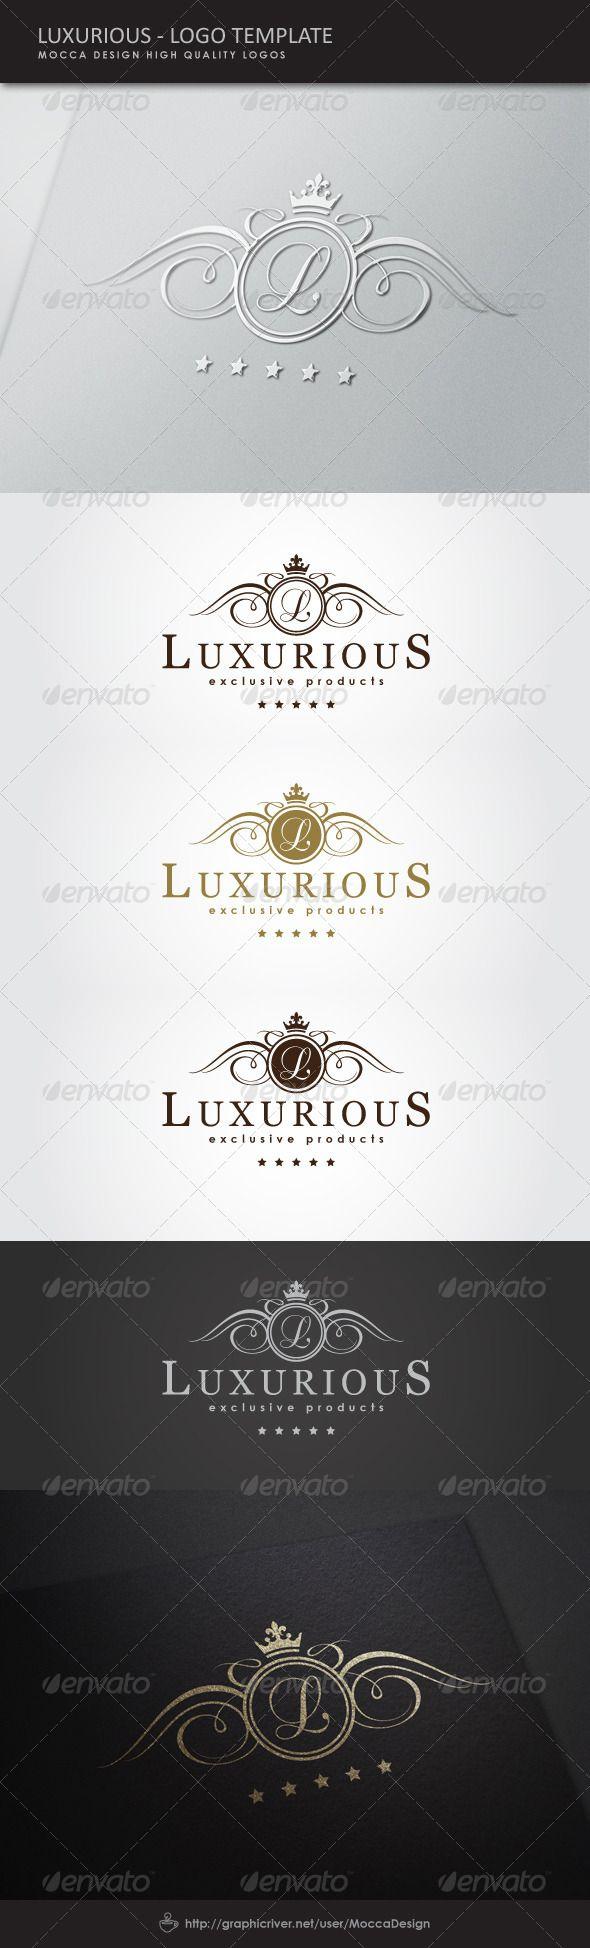 Luxurious Logo Elegant Logo Personal Identity And Logos